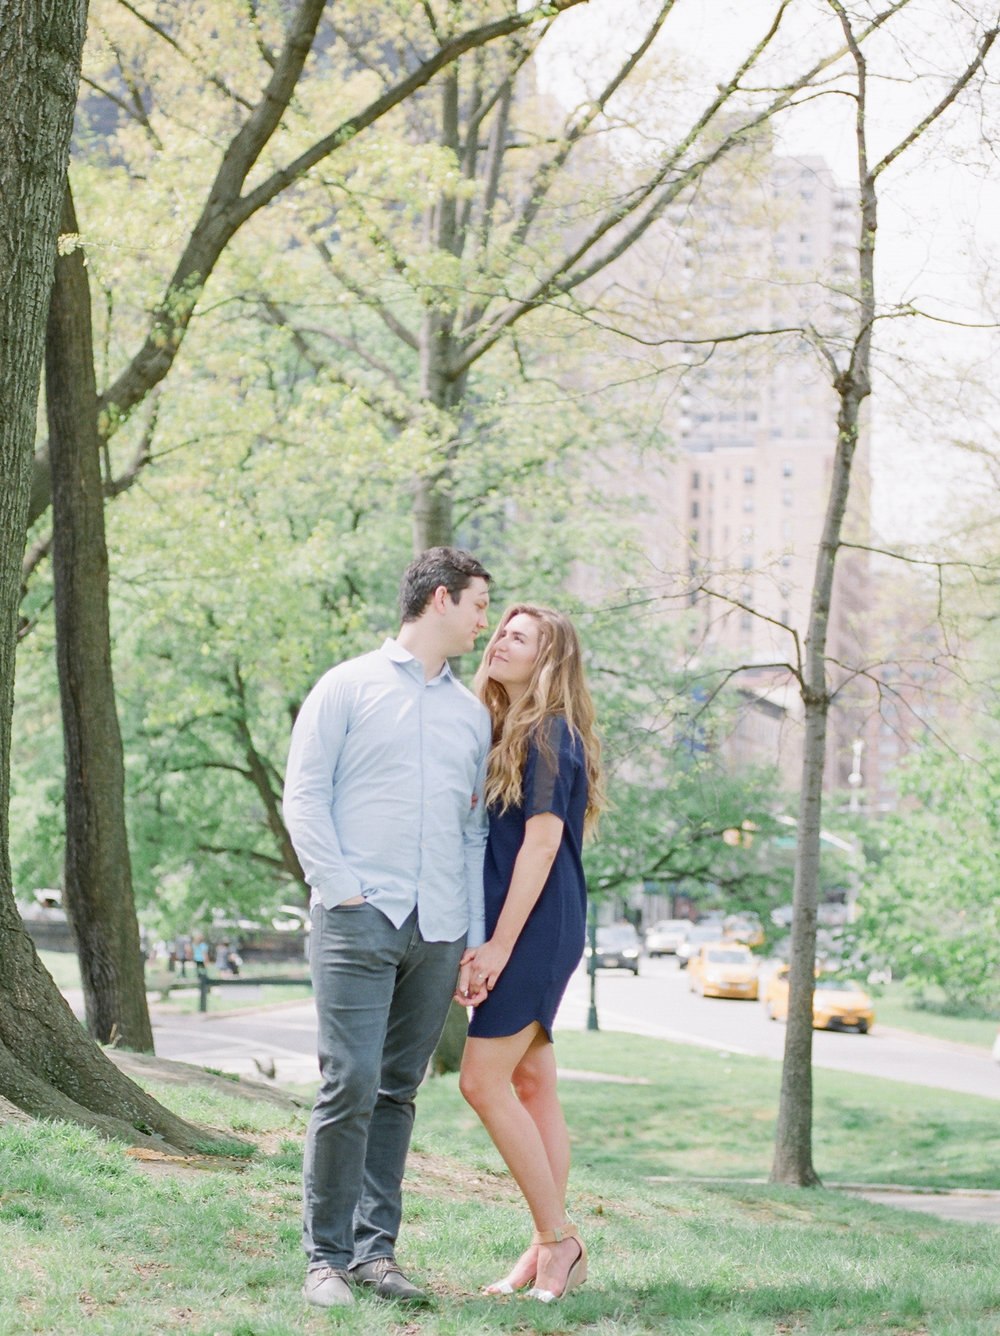 kels&michael_couplessite-1.jpg